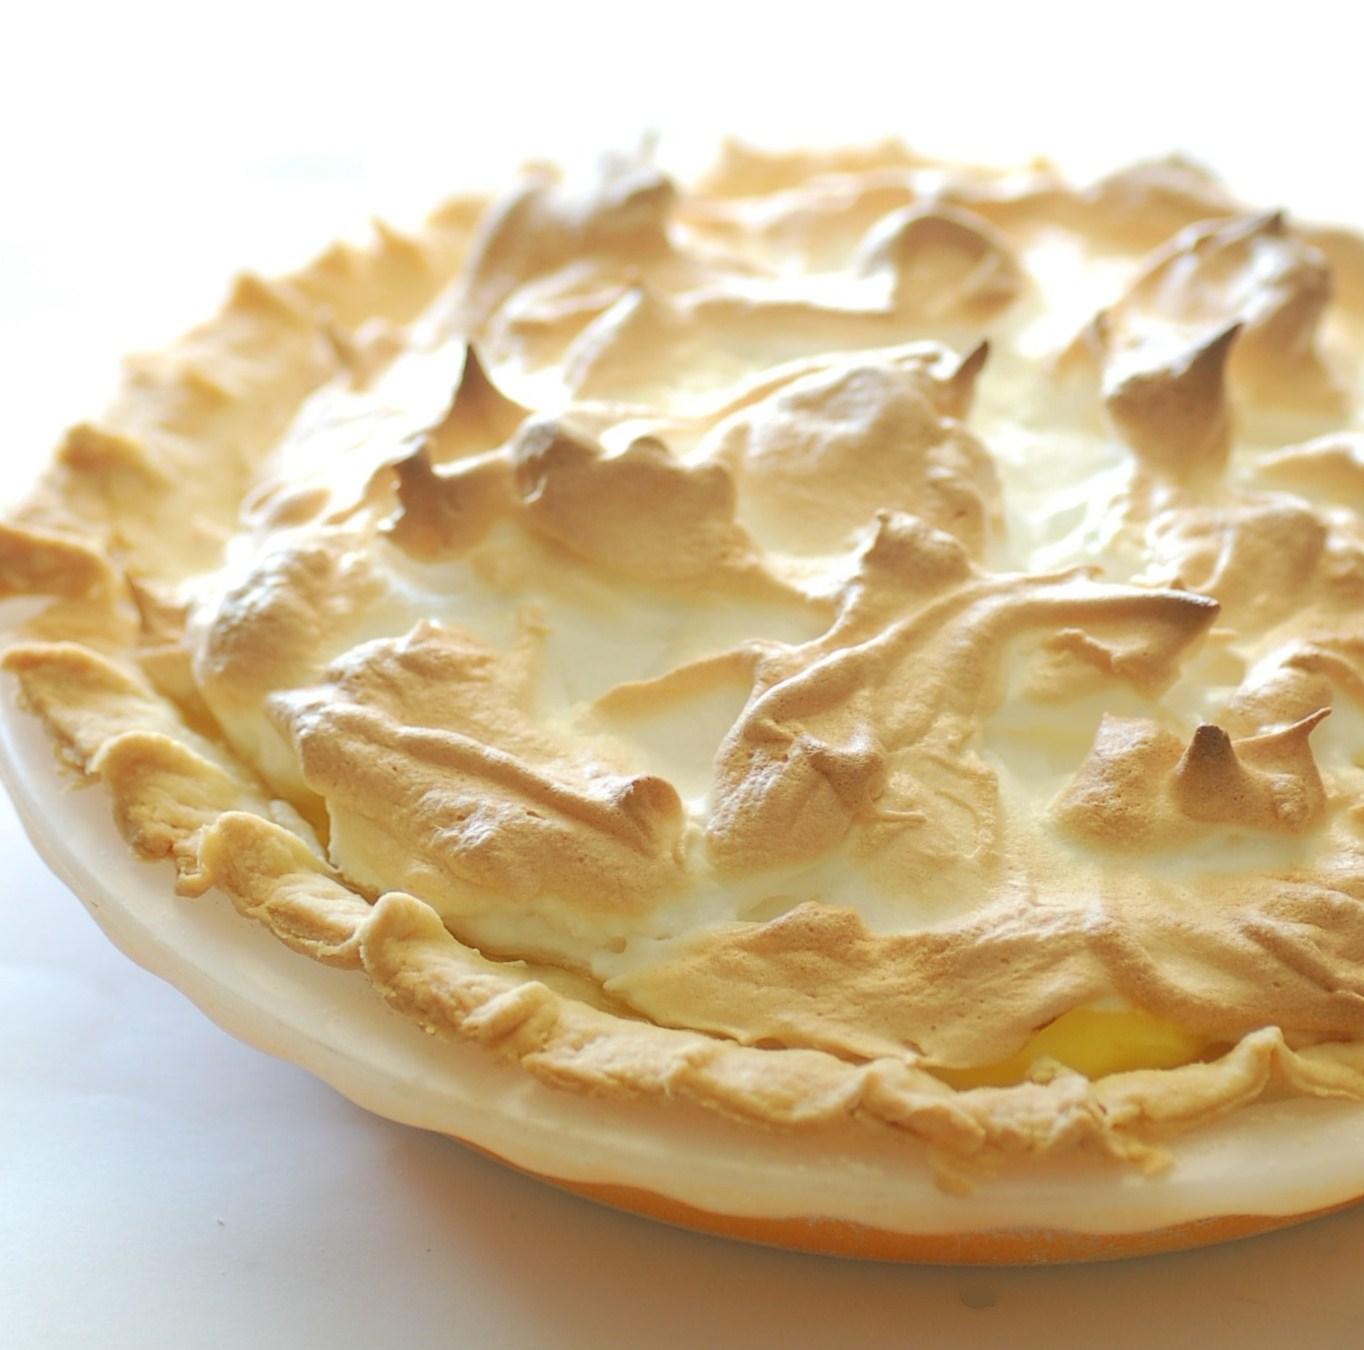 Waring cook book for the 8 buttonblender foodways pilgrim for Lemon meringue pie with graham cracker crust